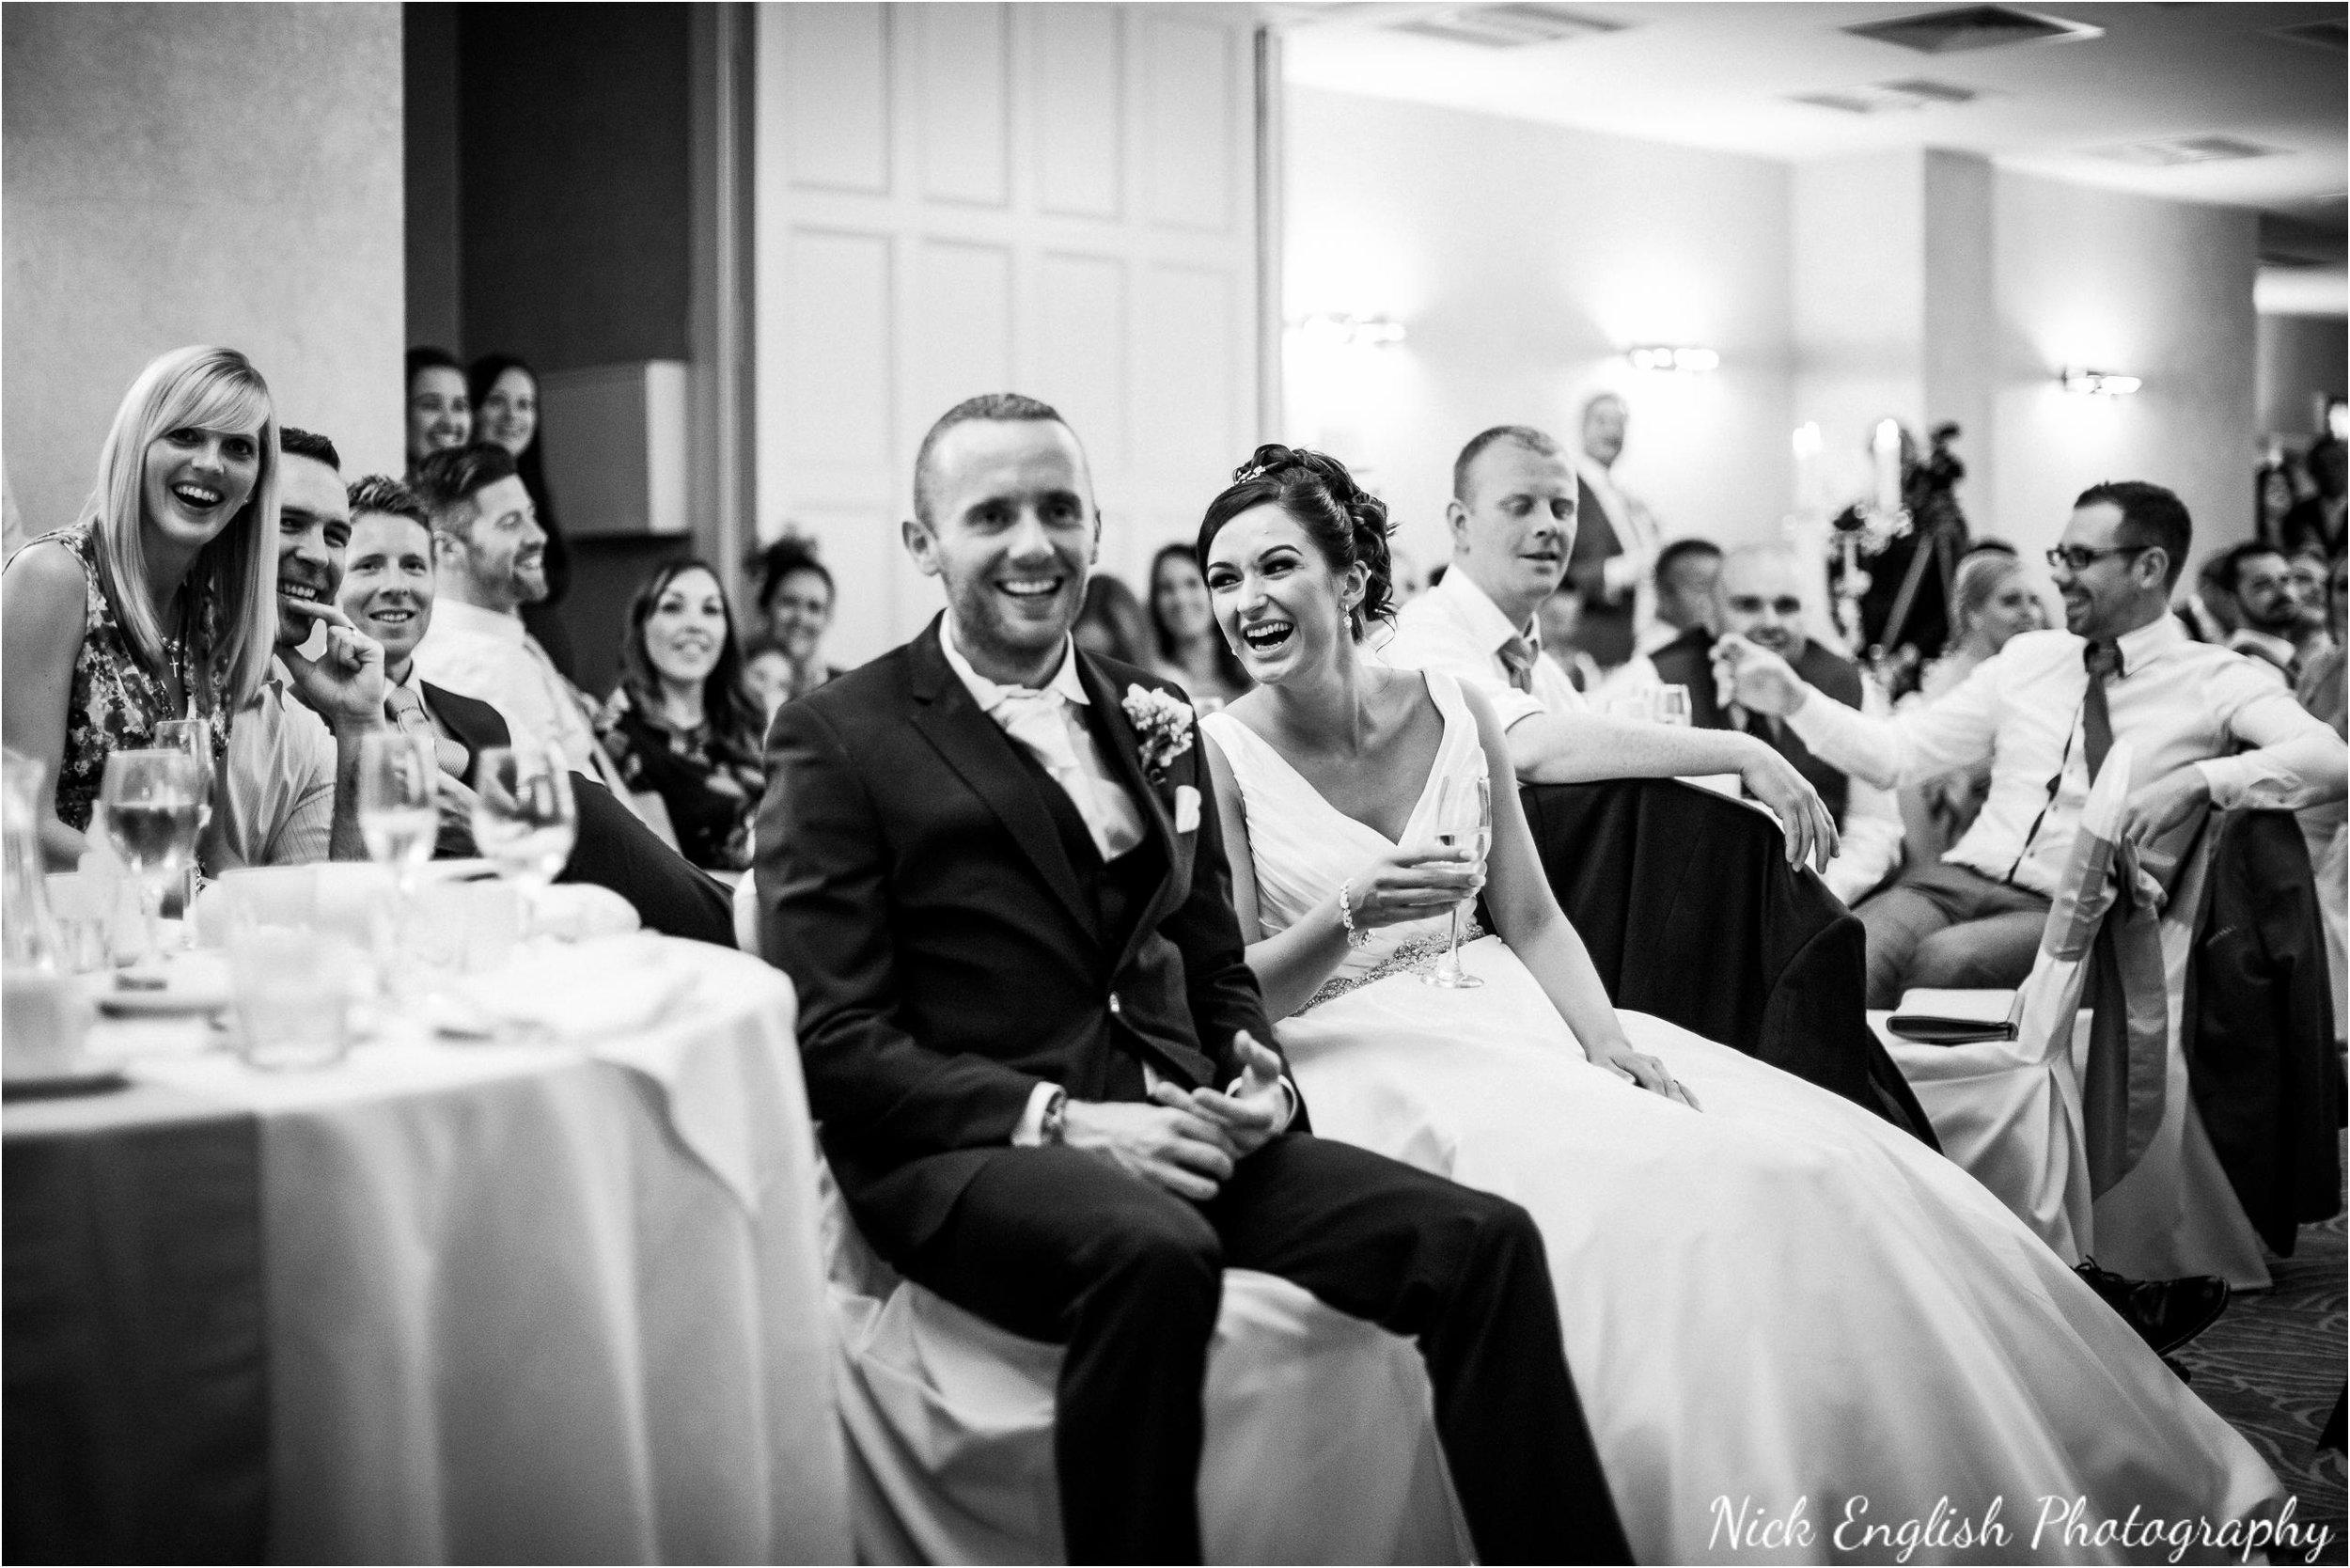 Emily David Wedding Photographs at Barton Grange Preston by Nick English Photography 180jpg.jpeg